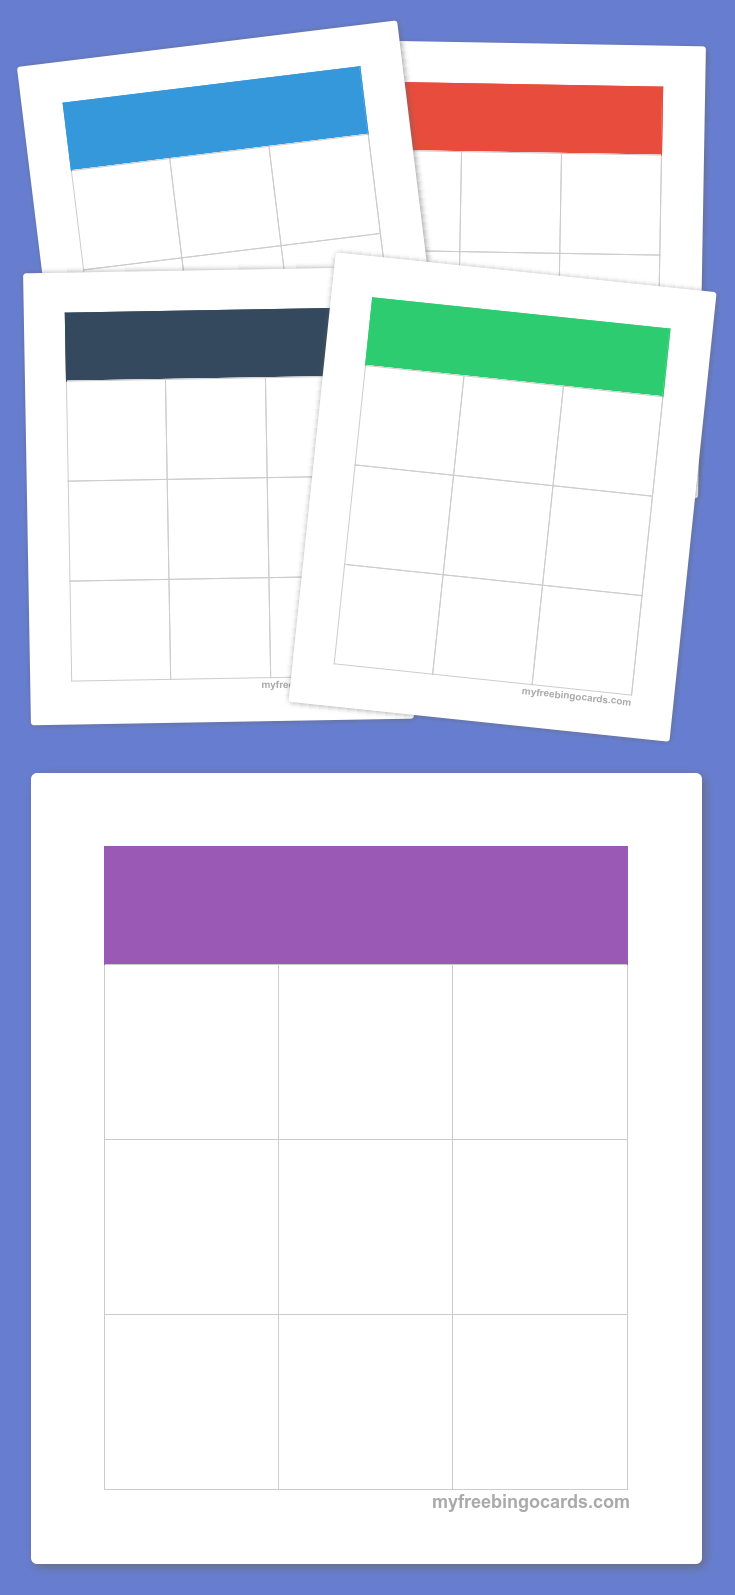 Free Printable Bingo Cards - Bingo, Kinderyoga En Prints